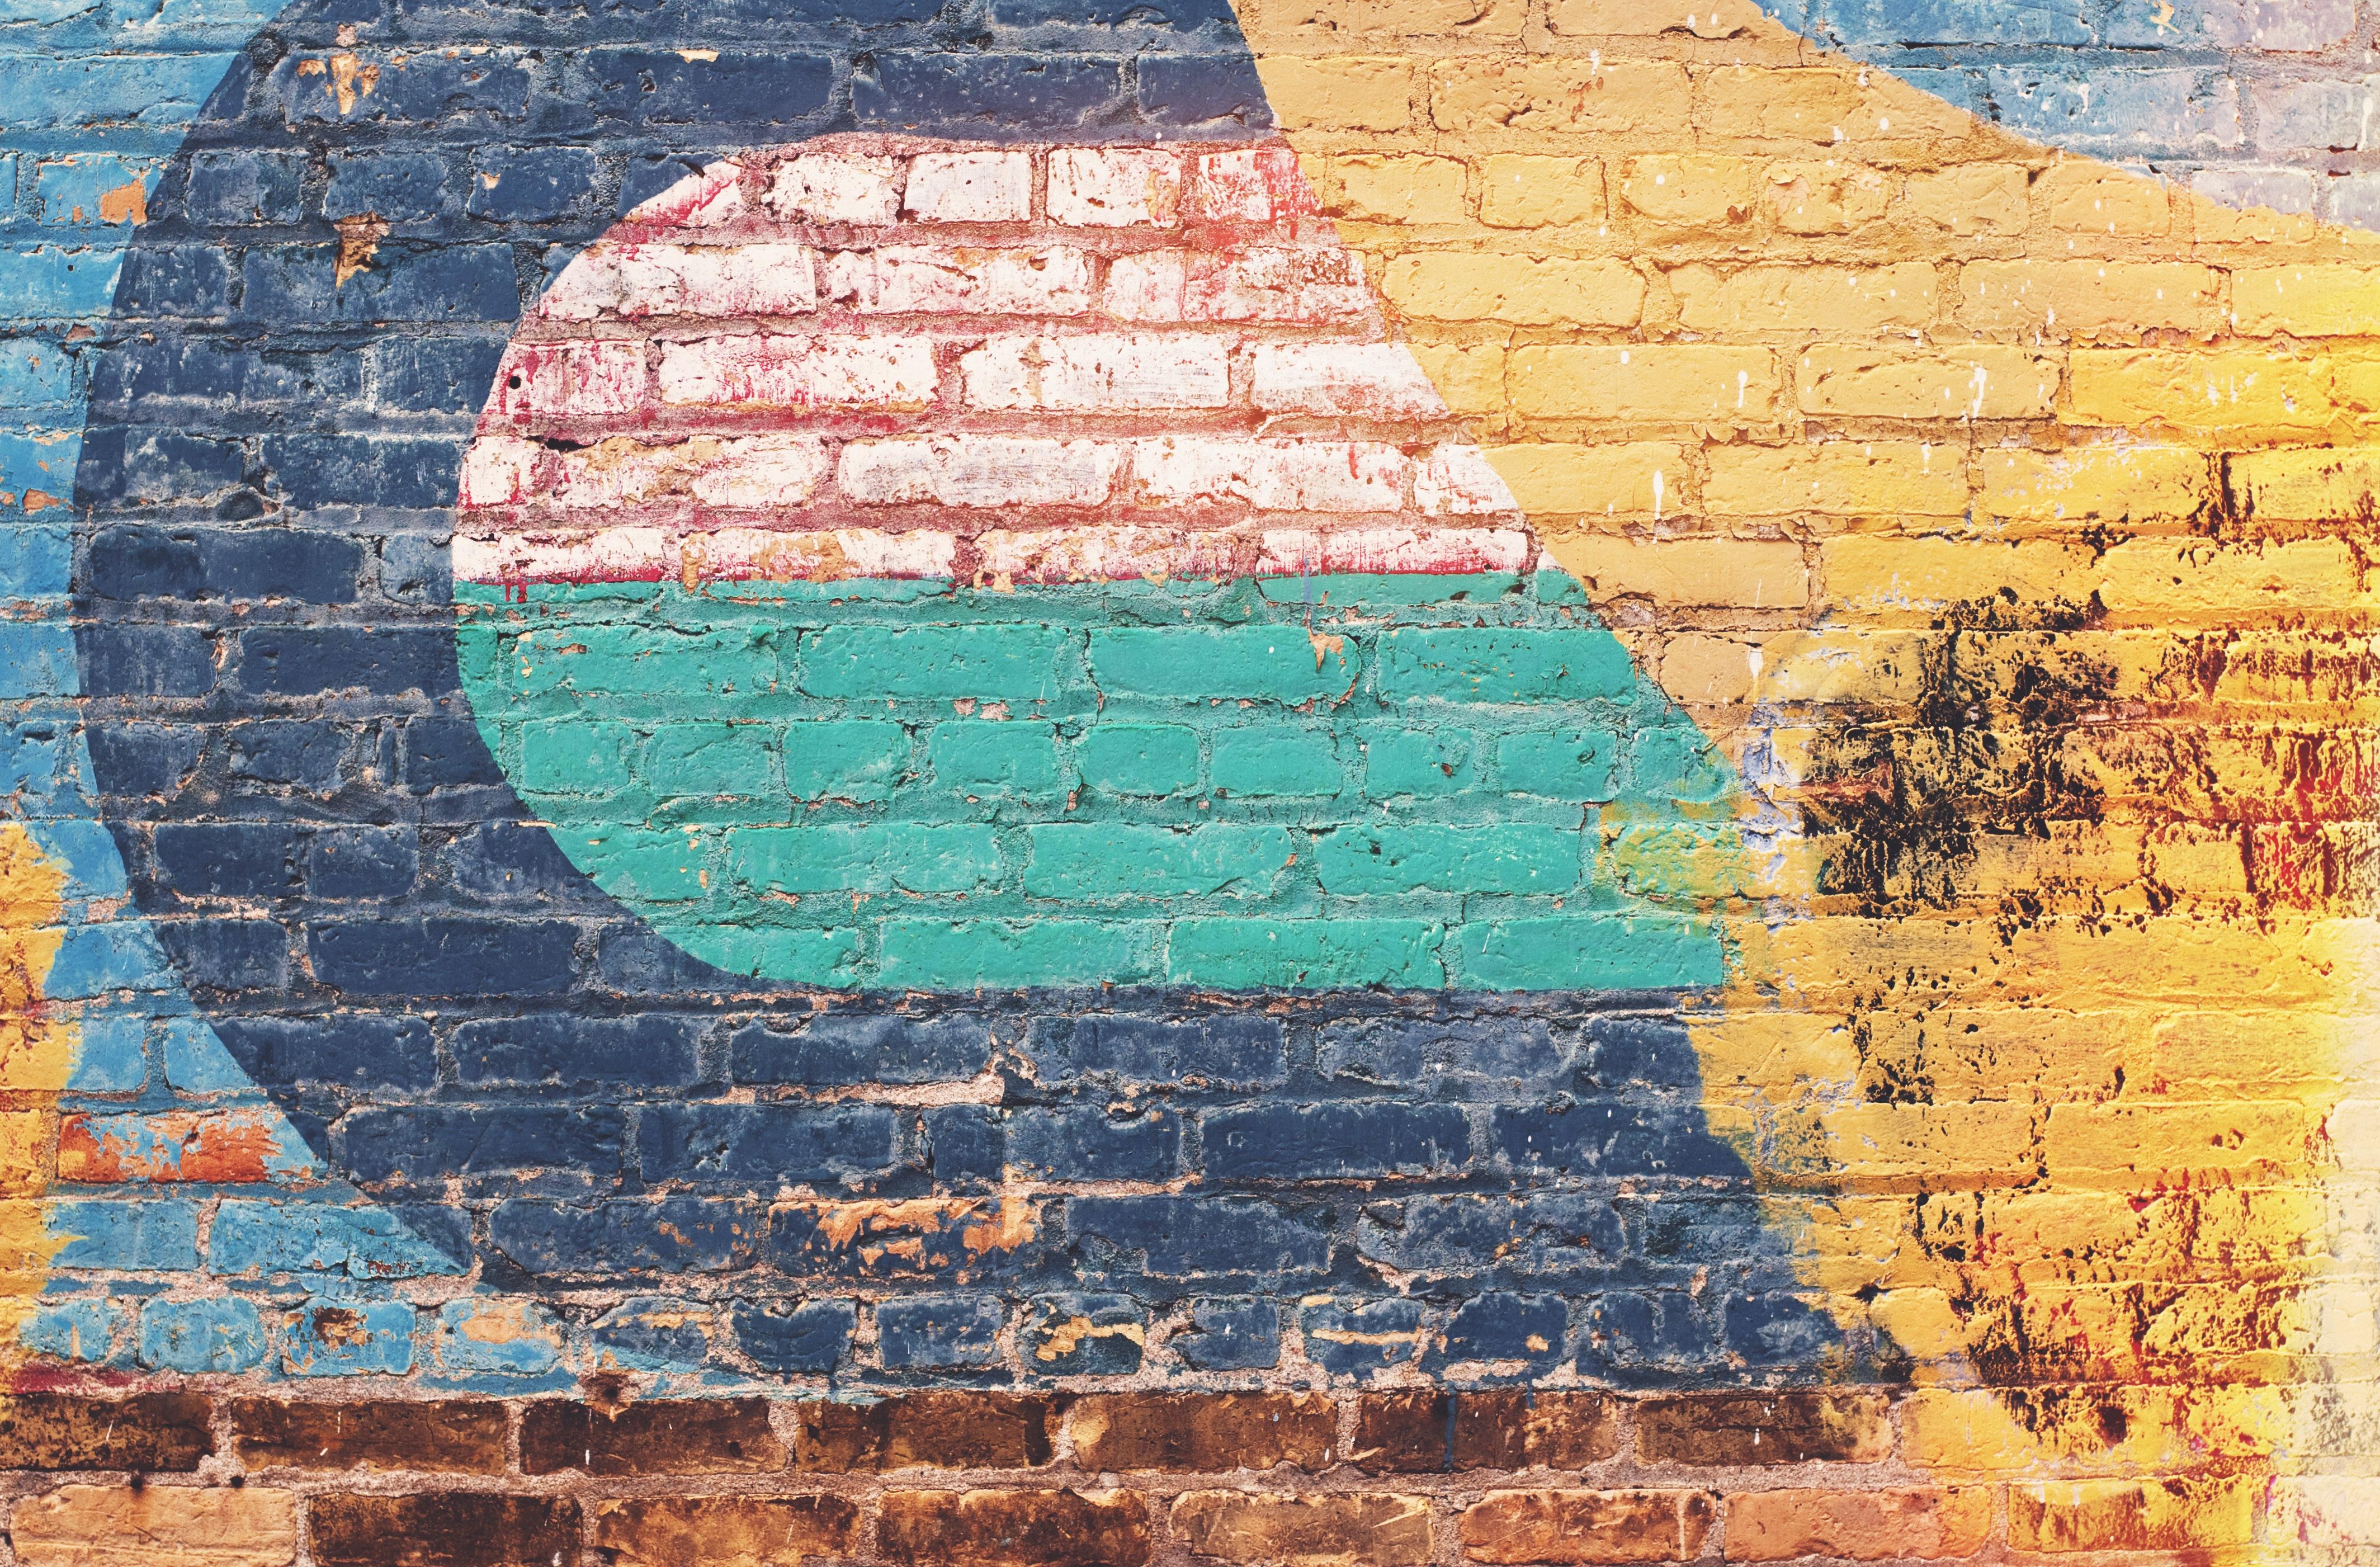 Astronaut Graffiti on Semi-Trailers · Free Stock Photo